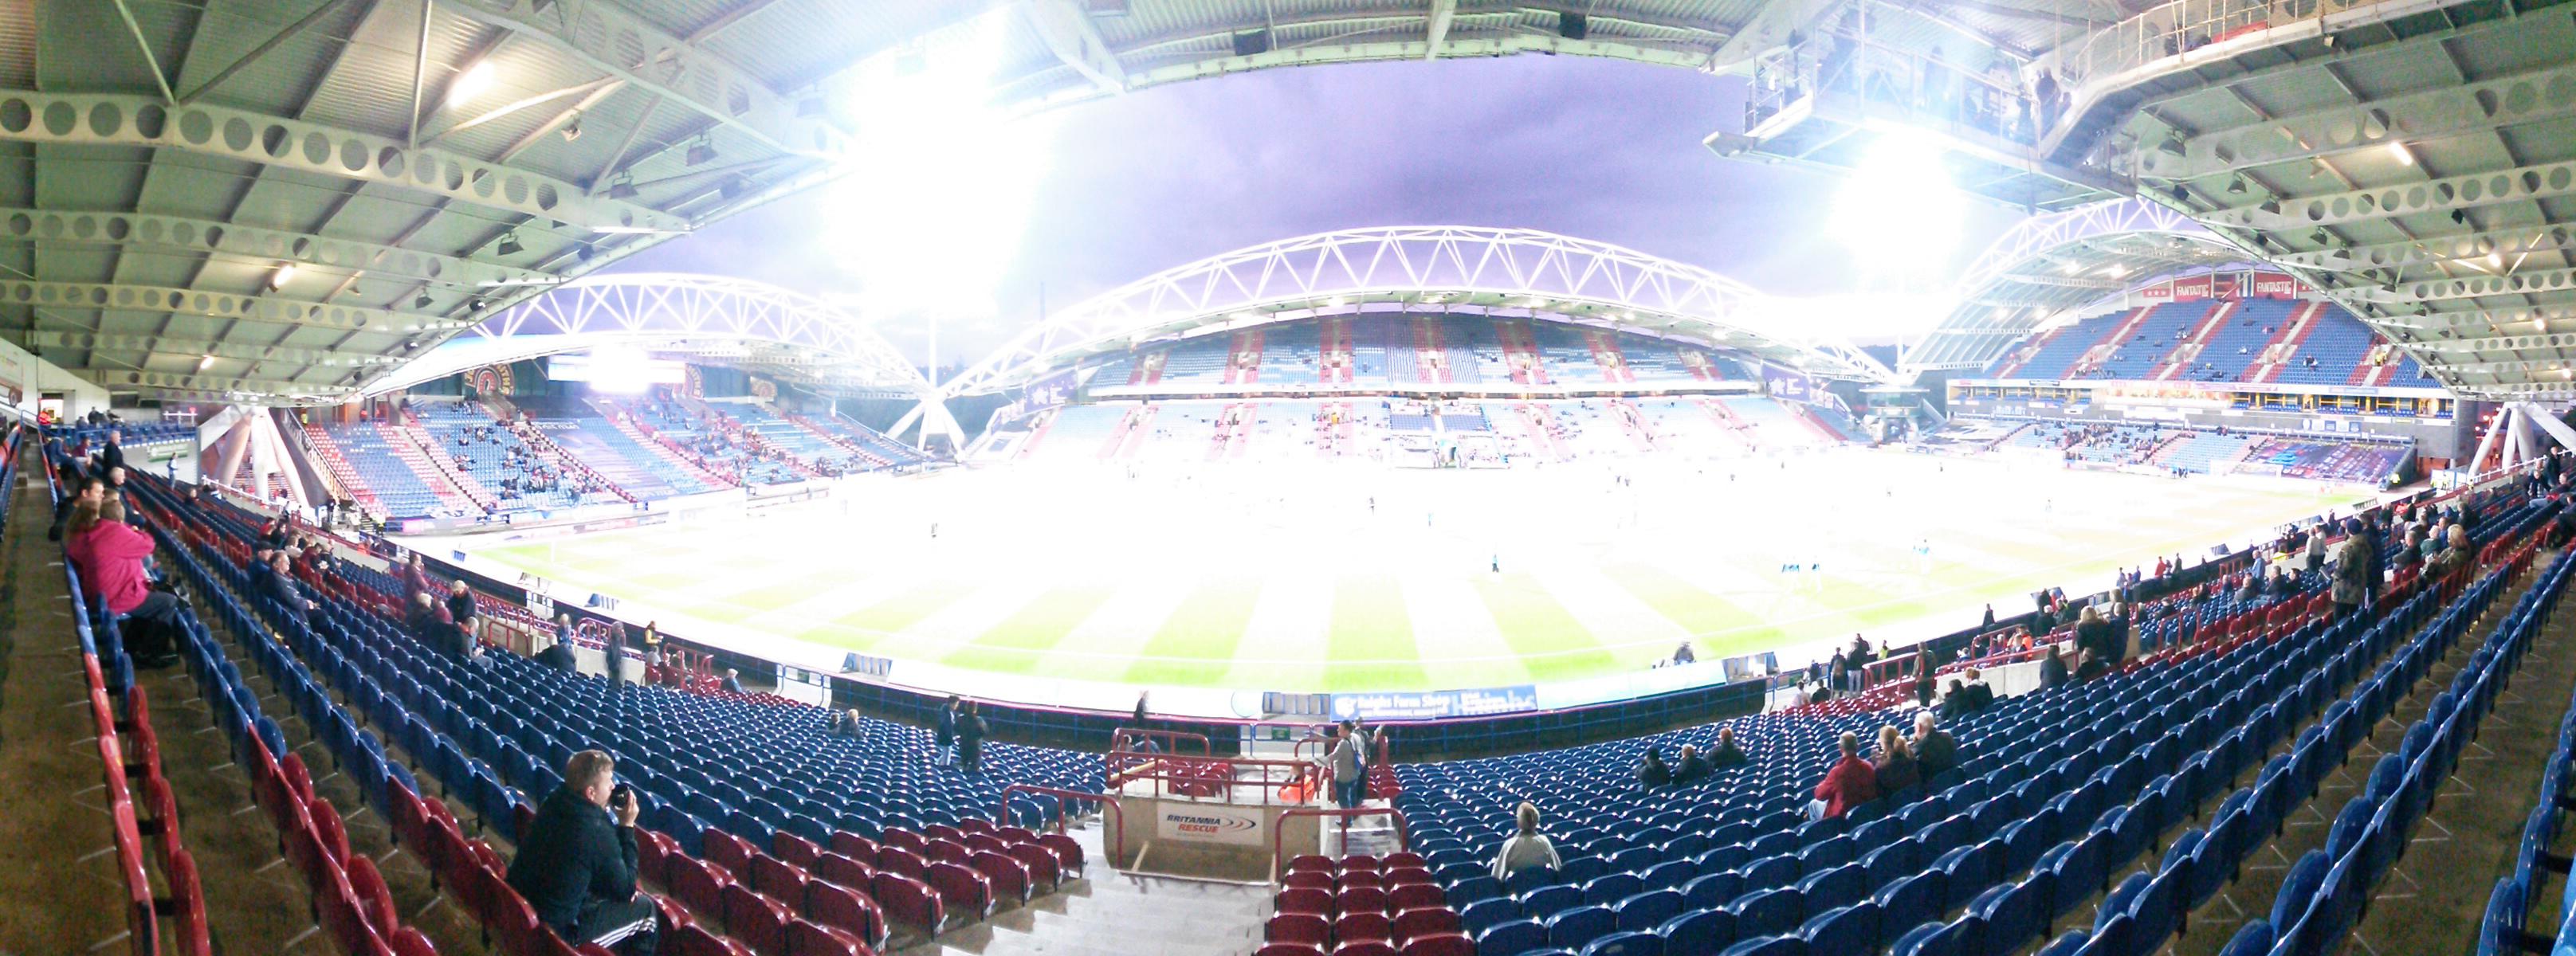 panoramic of john smith's stadium once the mcalpine stadium huddersfield